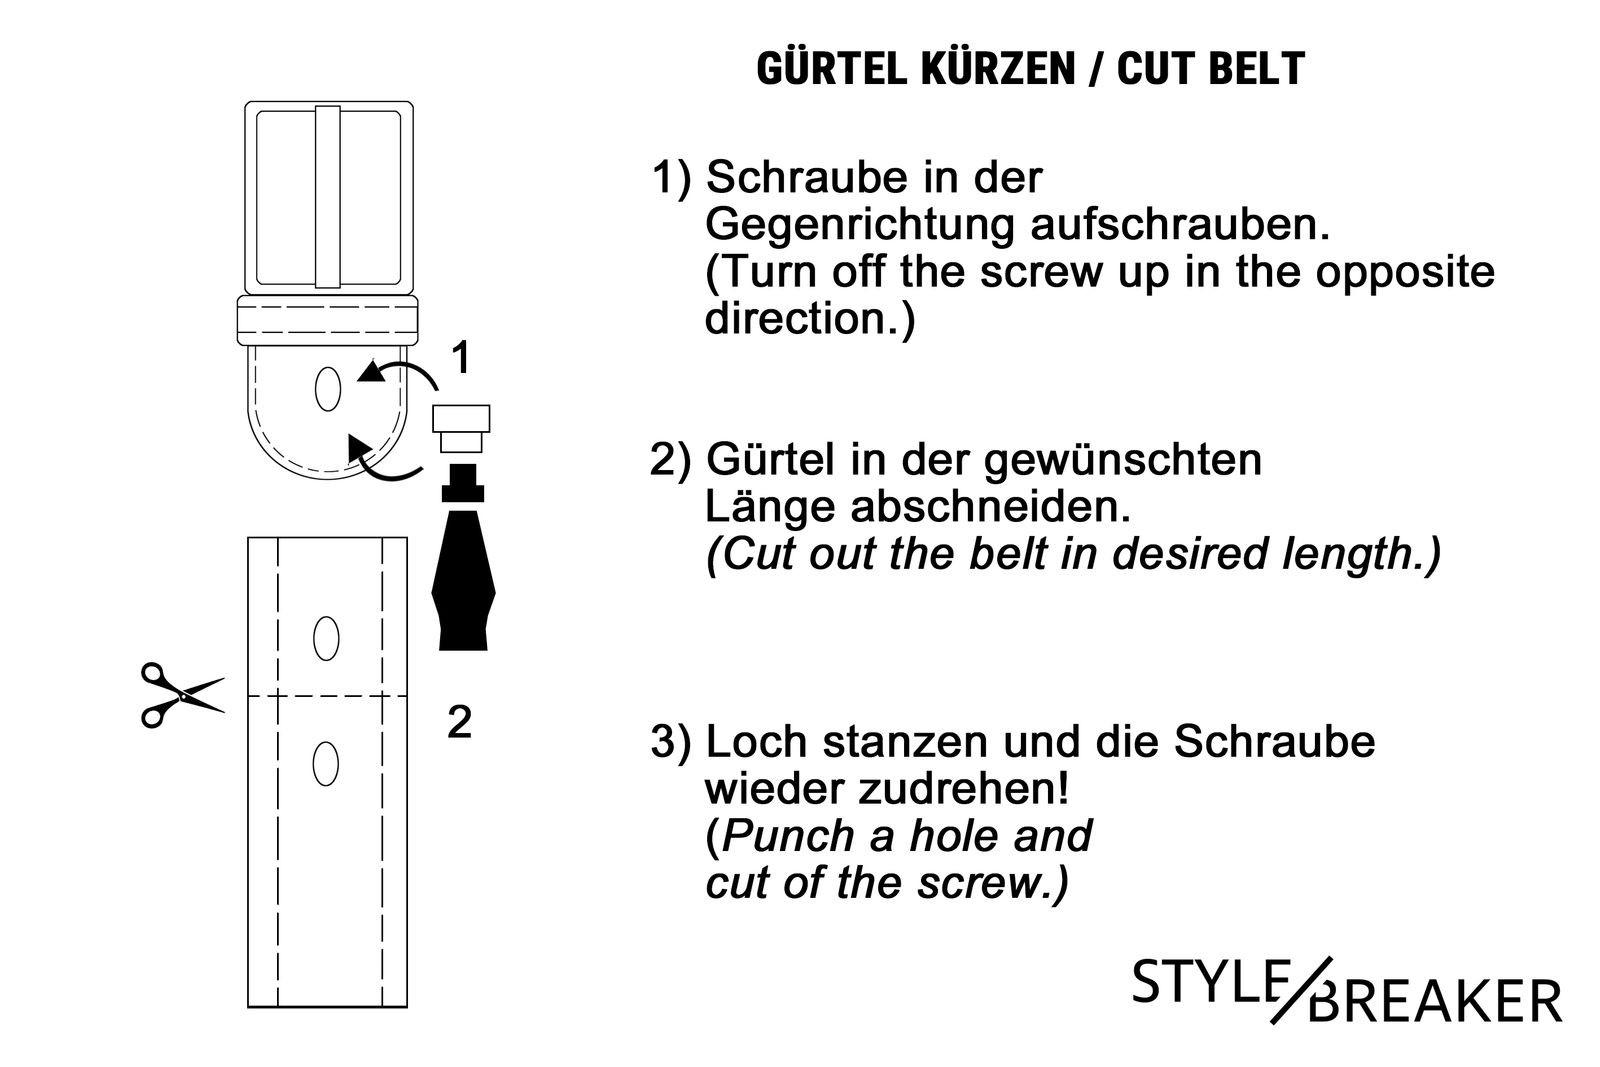 Vintage Design Unisex 03010098 k/ürzbar styleBREAKER G/ürtel Unifarben mit Oberfl/äche in Pinselstrich Optik Used Look